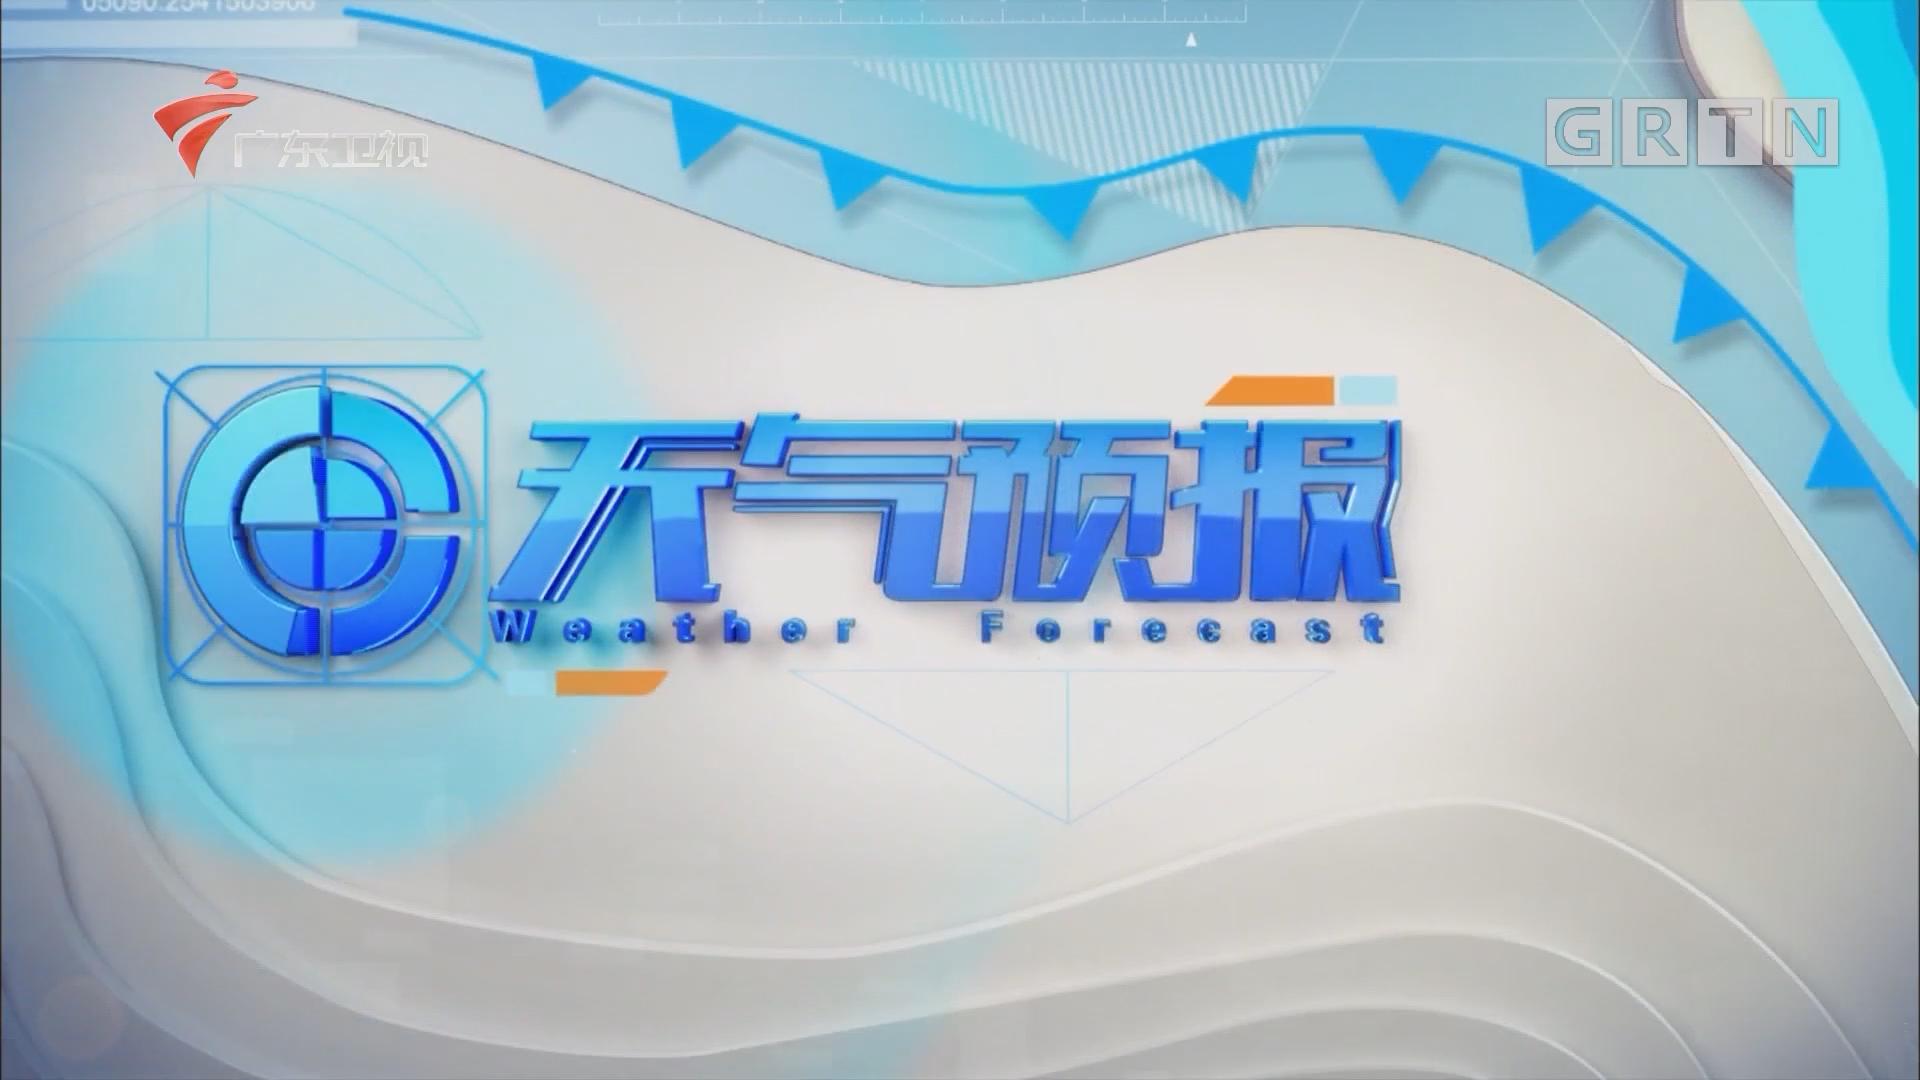 [HD][2019-08-29]广东天气预报